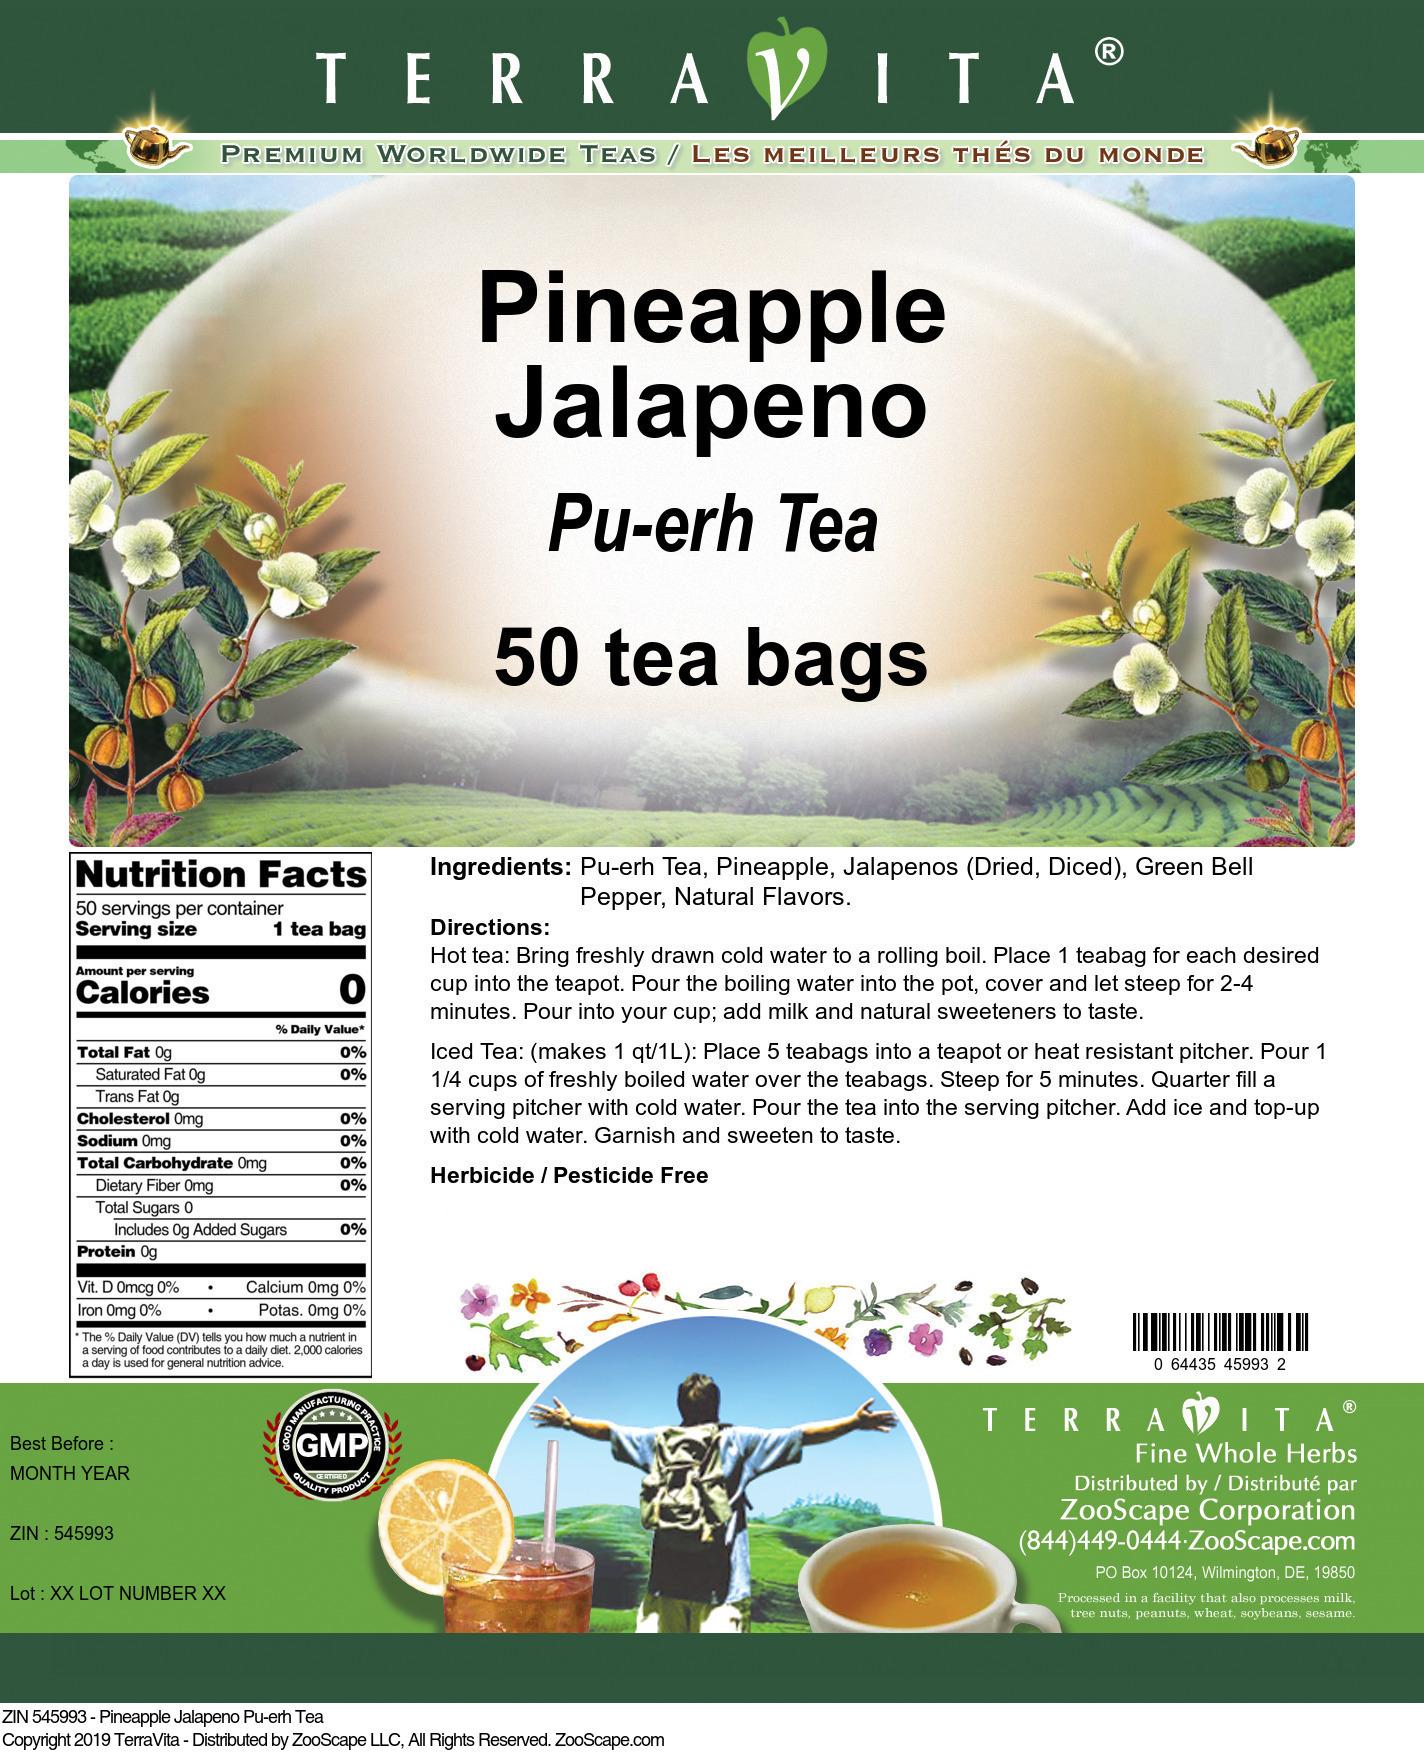 Pineapple Jalapeno Pu-erh Tea